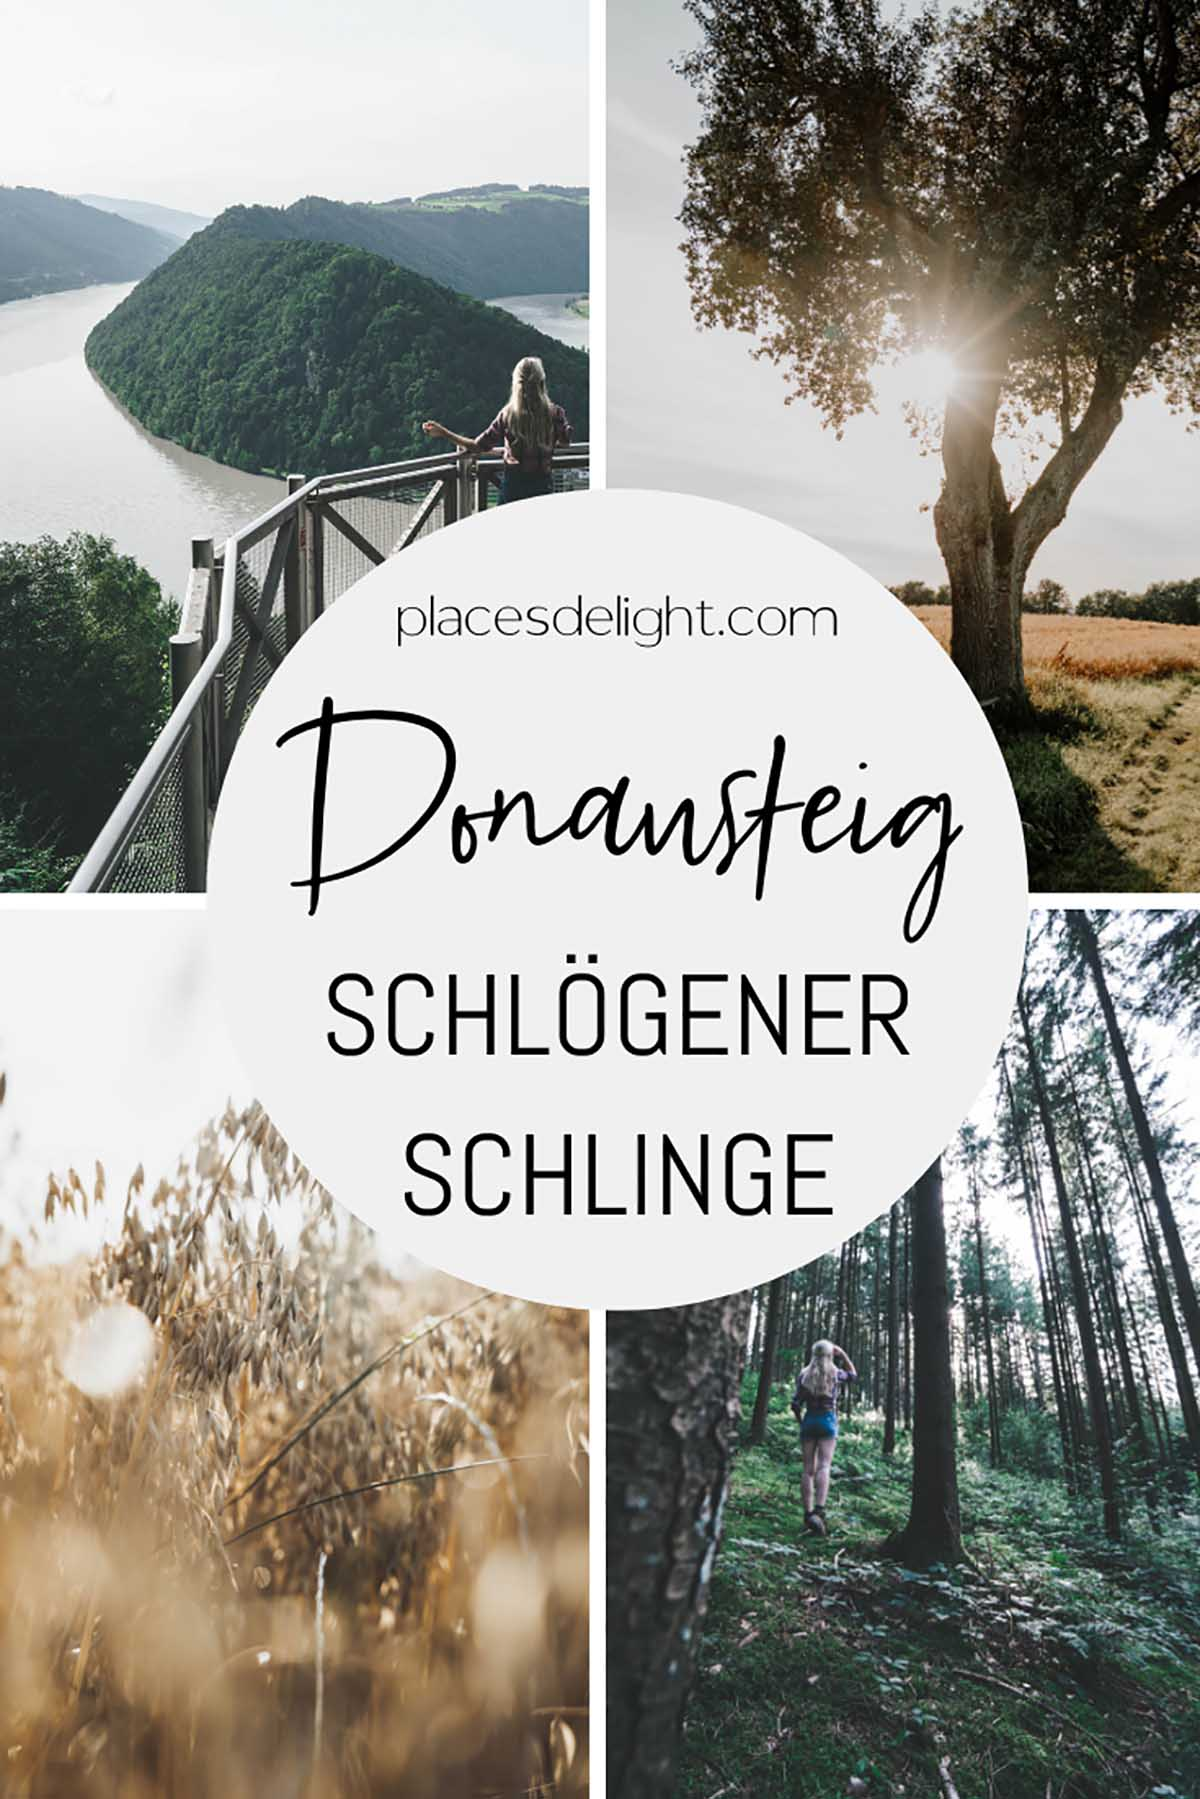 wandern-am-donausteig-schloegener-schlinge-placesdelight